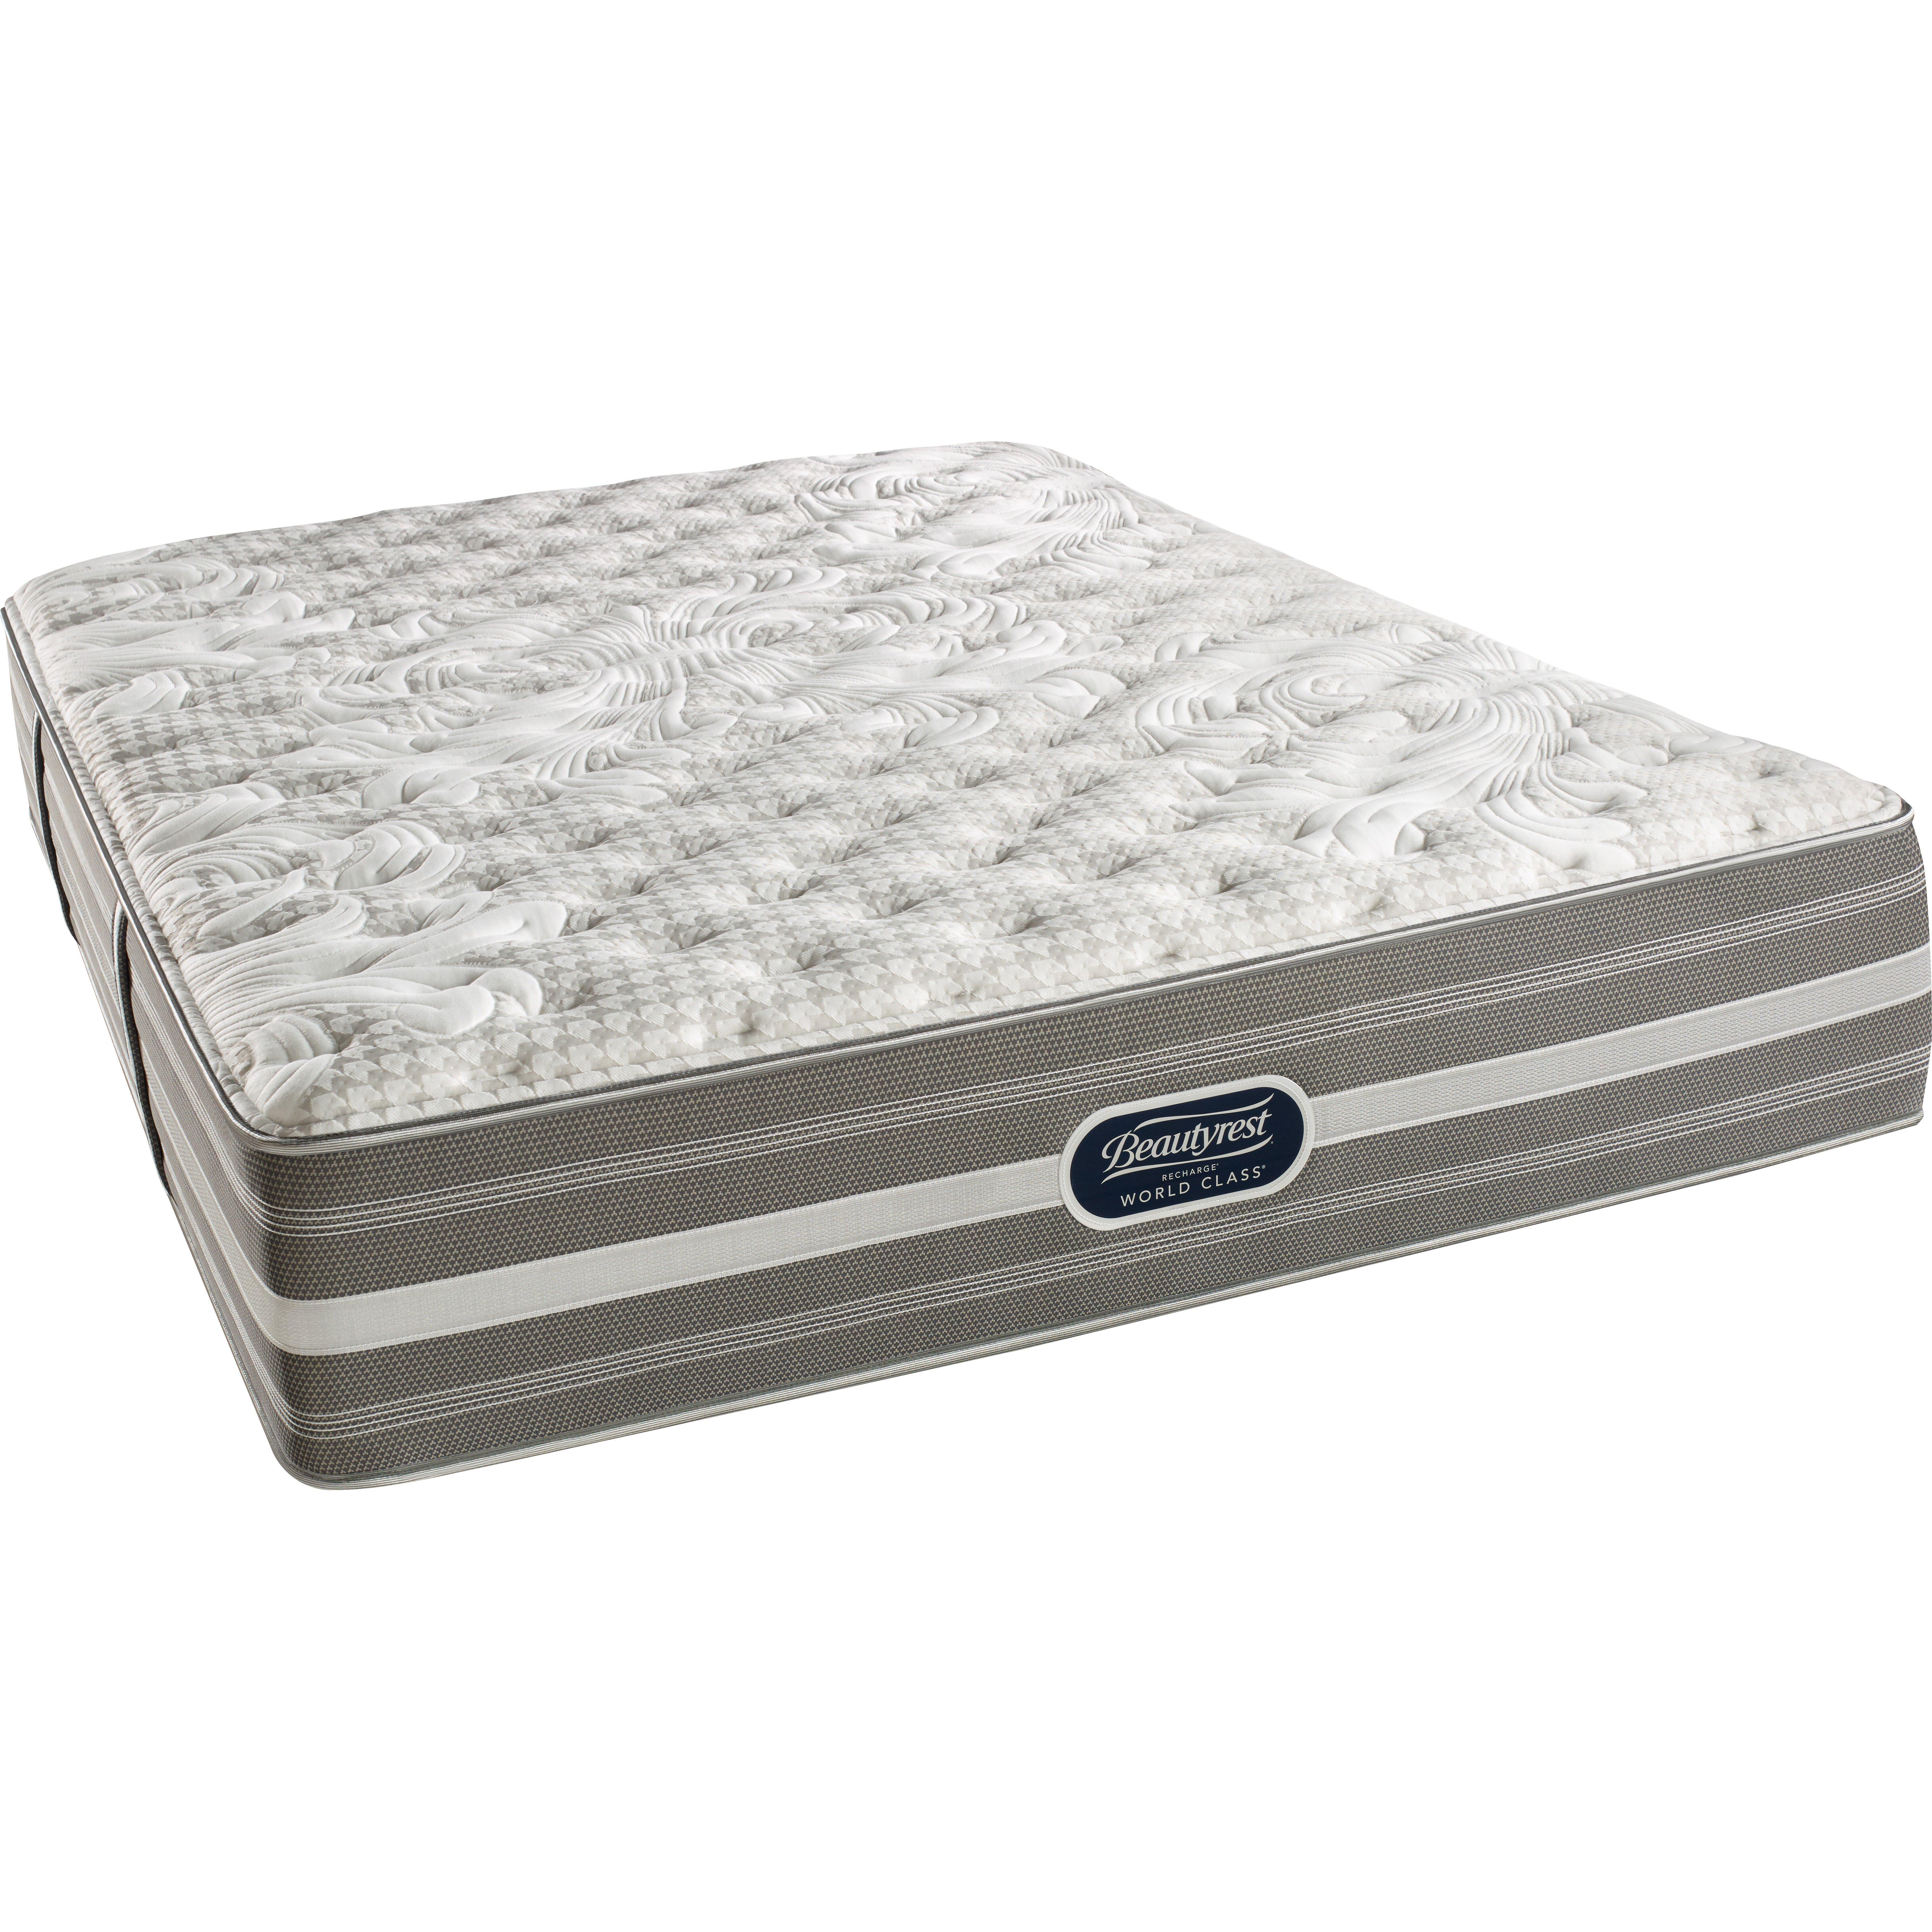 image perfect day iseries by serta enjoyment mattress set ca